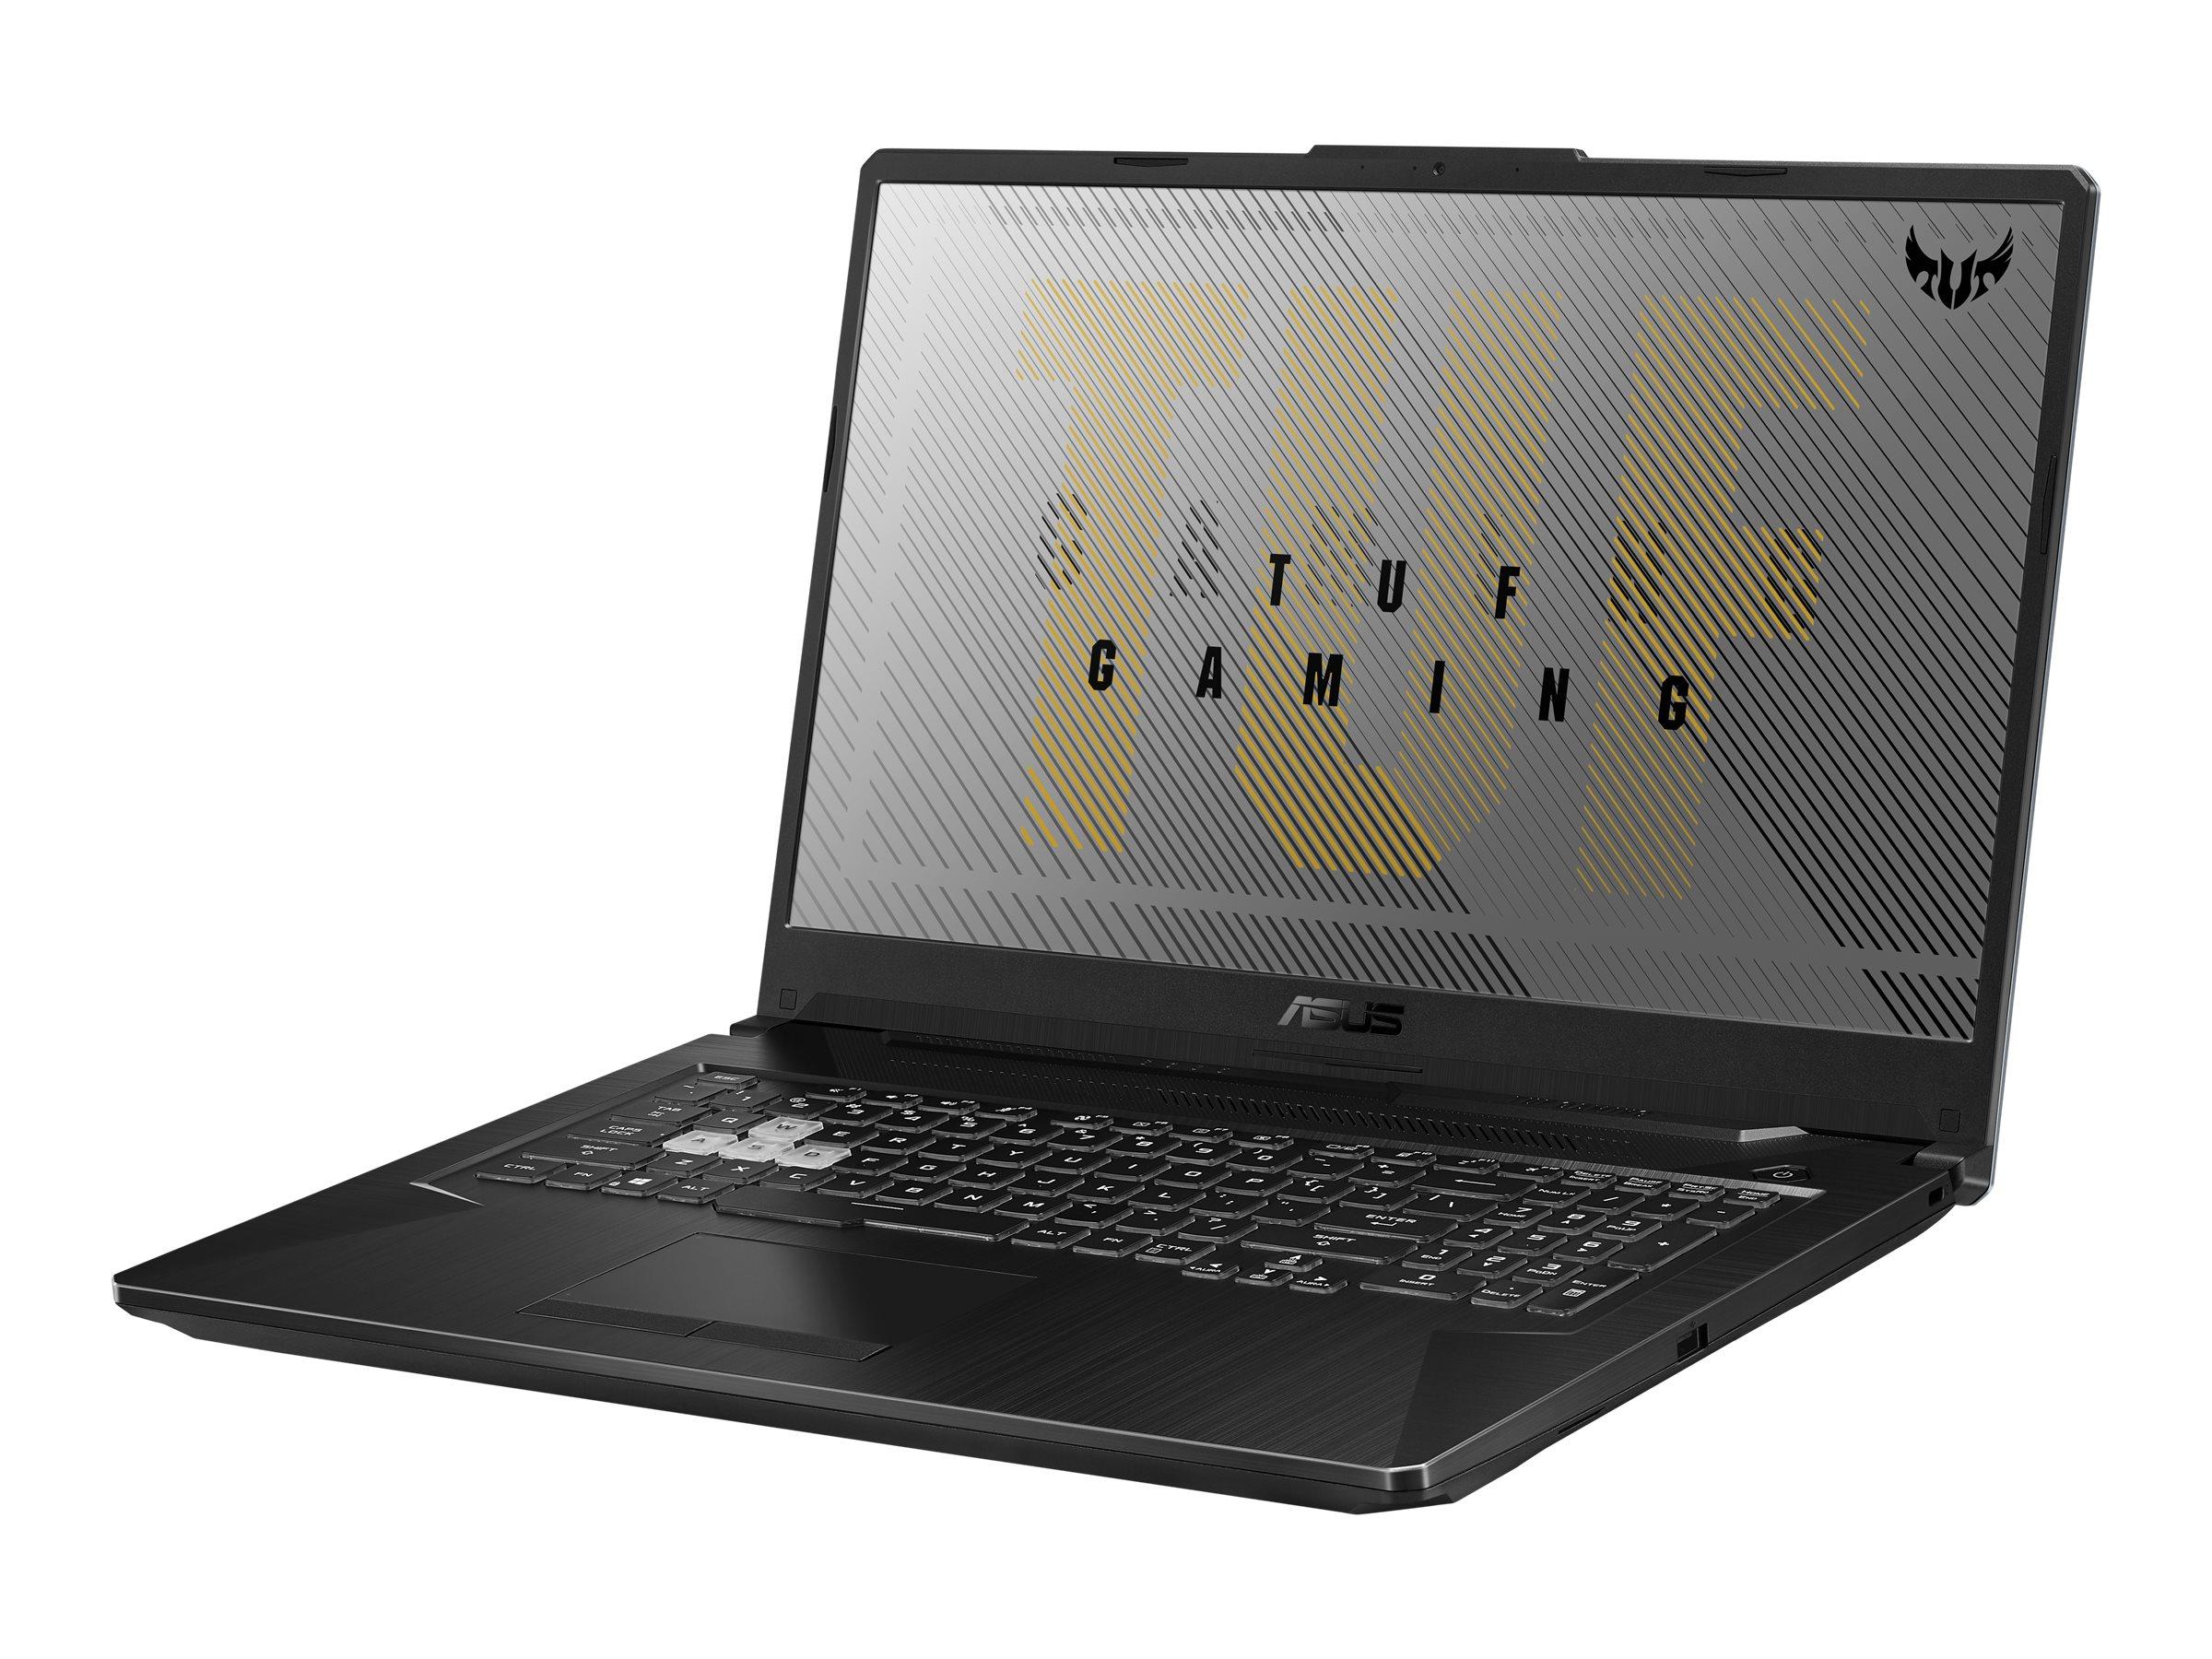 "ASUS TUF Gaming A17 FA706II-H7021T - Ryzen 5 4600H / 3 GHz - Win 10 Home 64-Bit - 8 GB RAM - 512 GB SSD - 43.9 cm (17.3"""